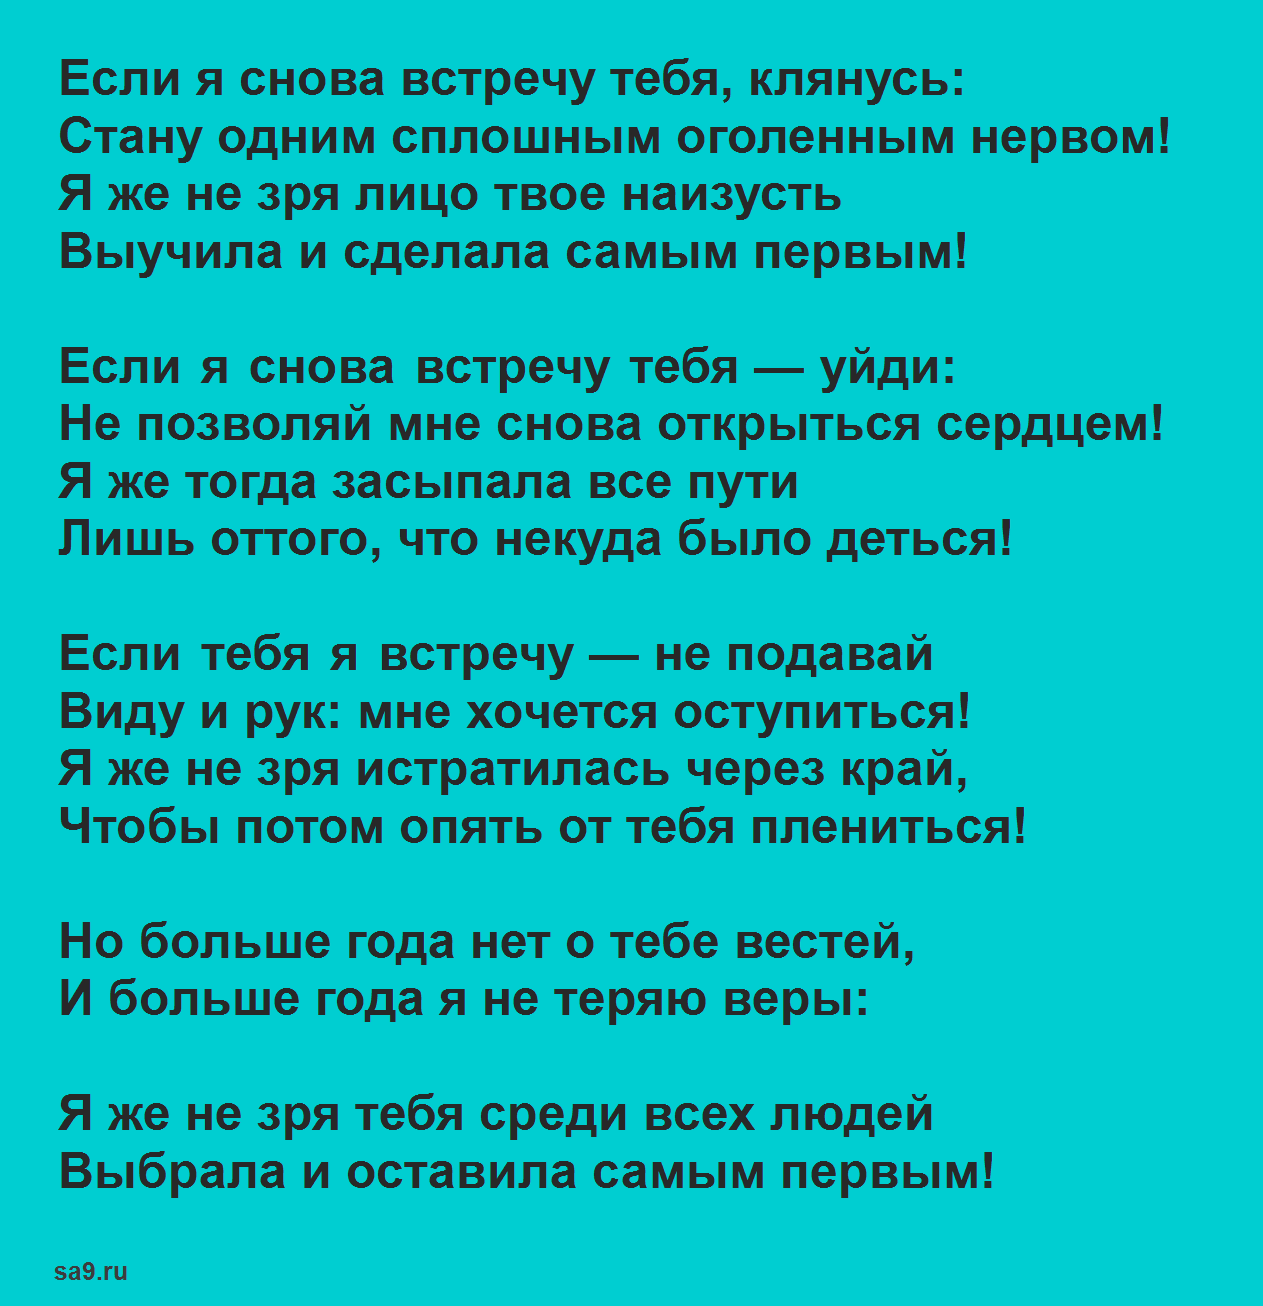 Астахова стихи о любви к мужчине - Если я снова встречу тебя, клянусь